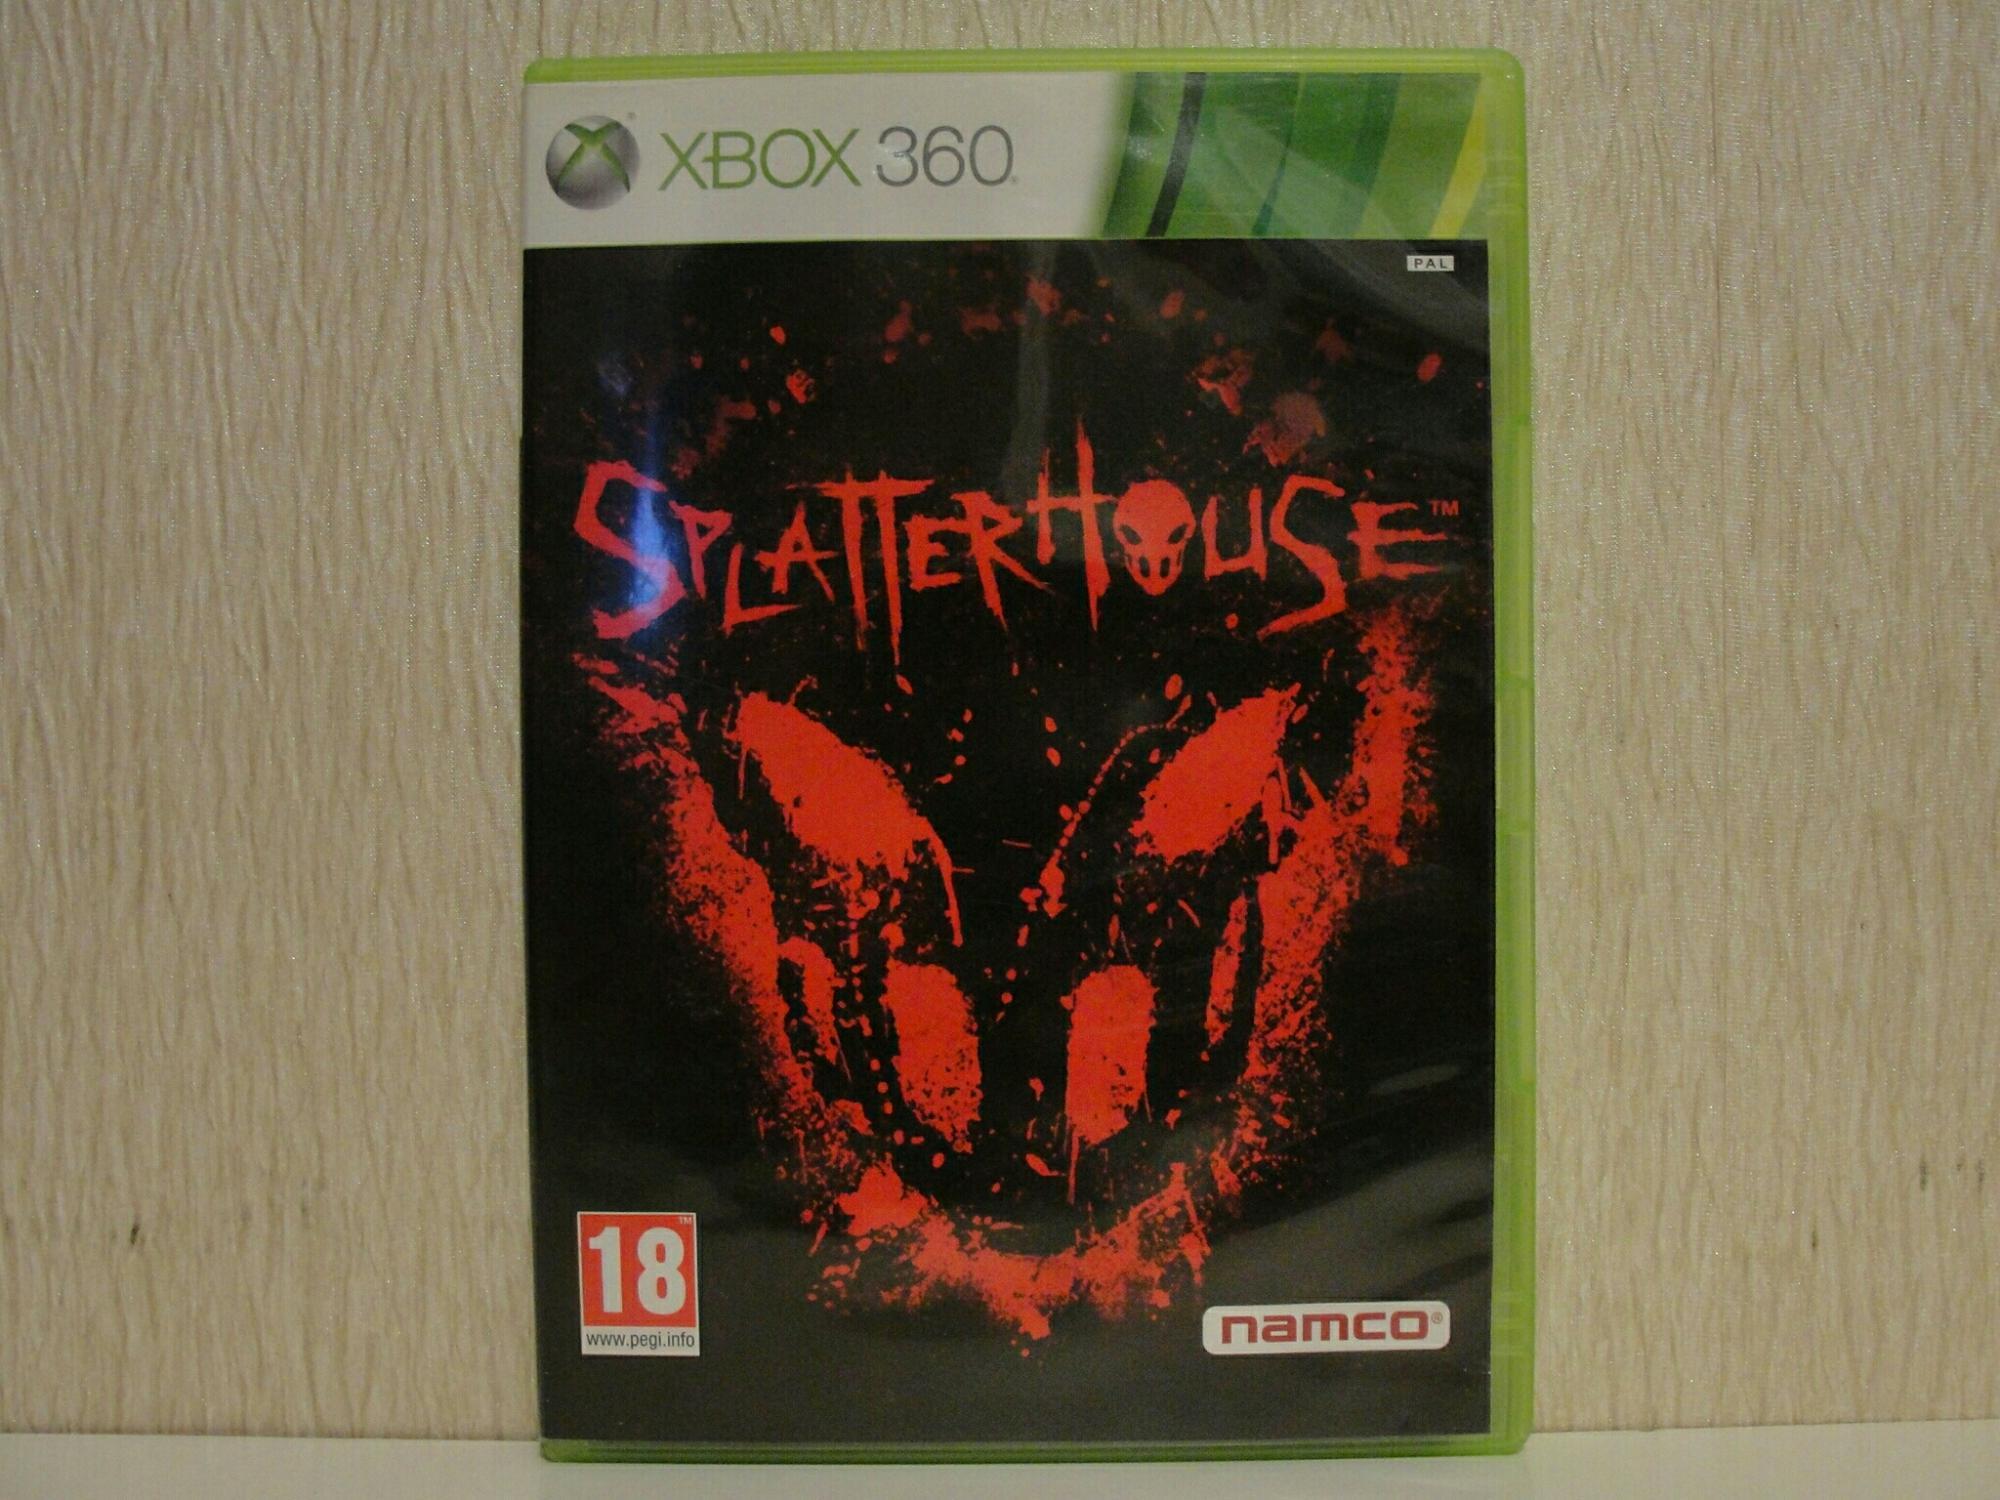 Splatterhouse Xbox 360 в Москве 89772562788 купить 1